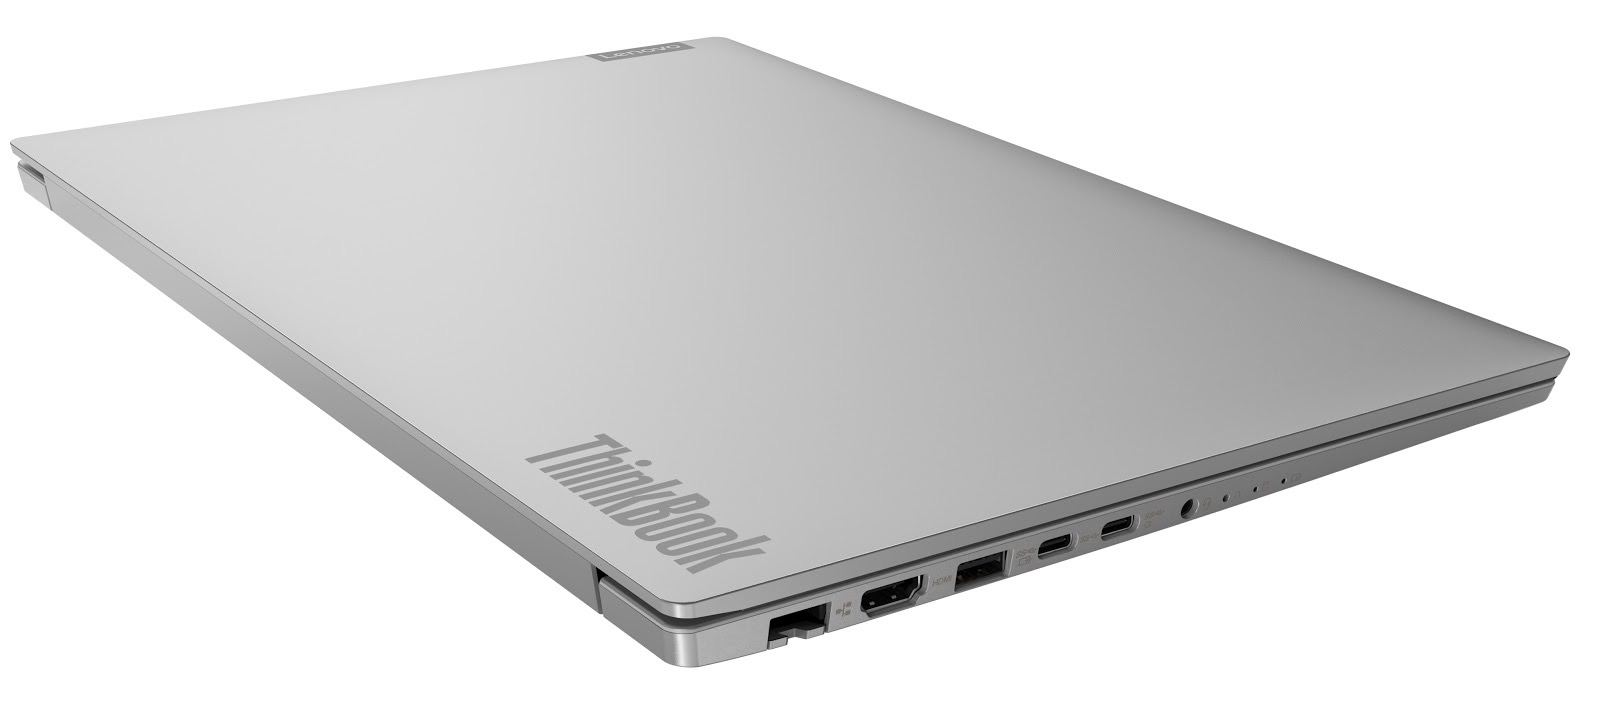 Фото 3. Ноутбук Lenovo ThinkBook 15-IIL (20SM002JUA)